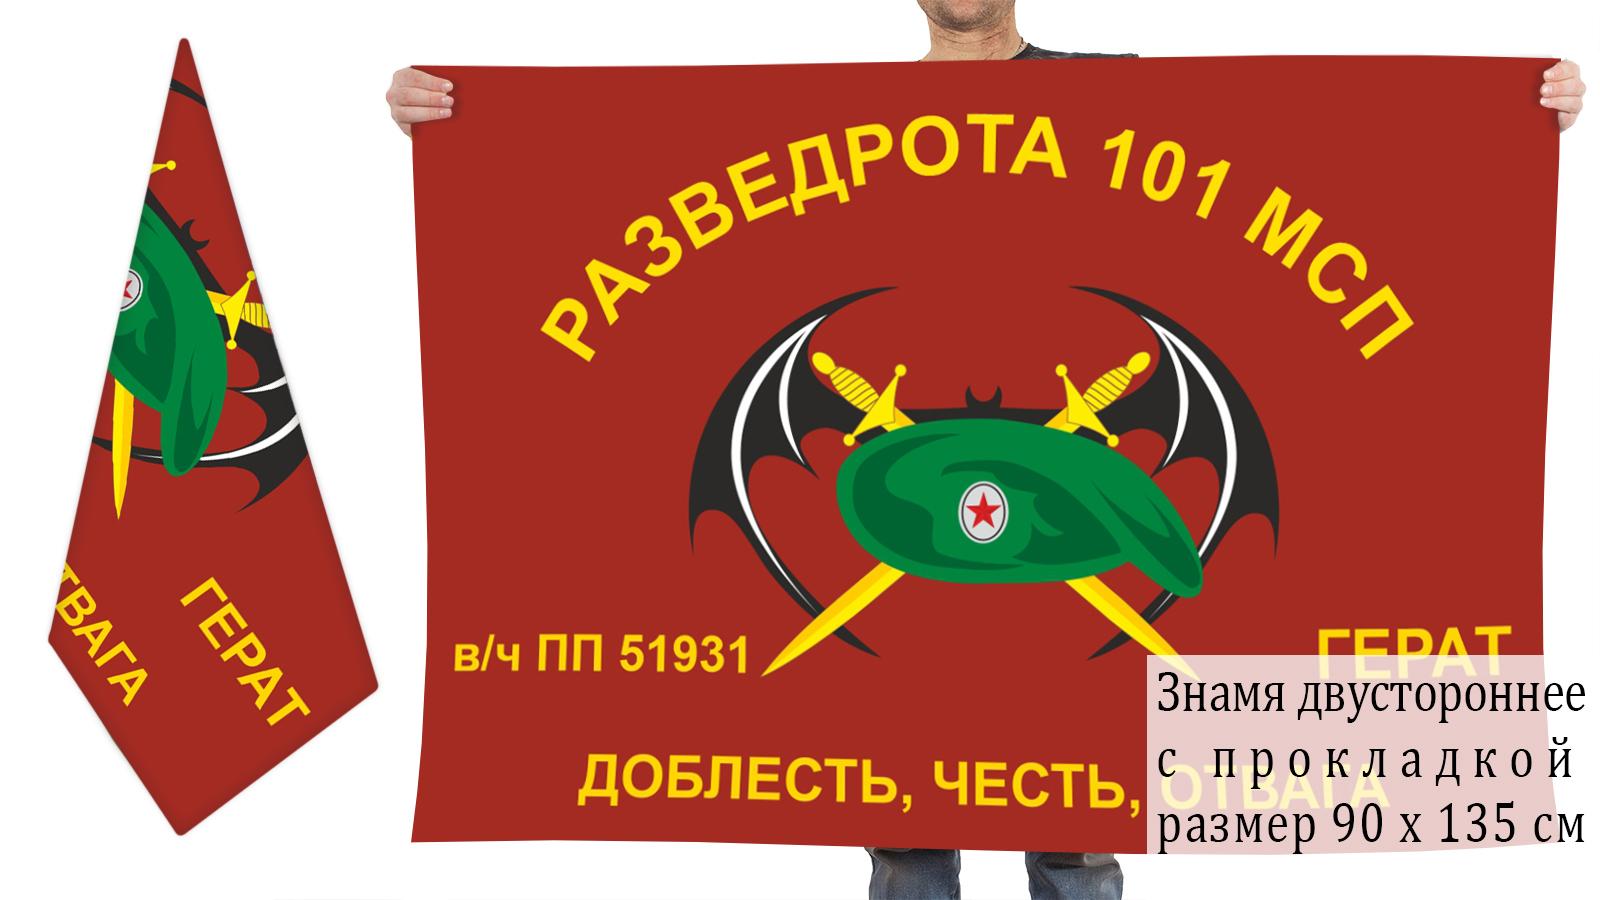 Двусторонний флаг разведроты 101 мотострелкового полка